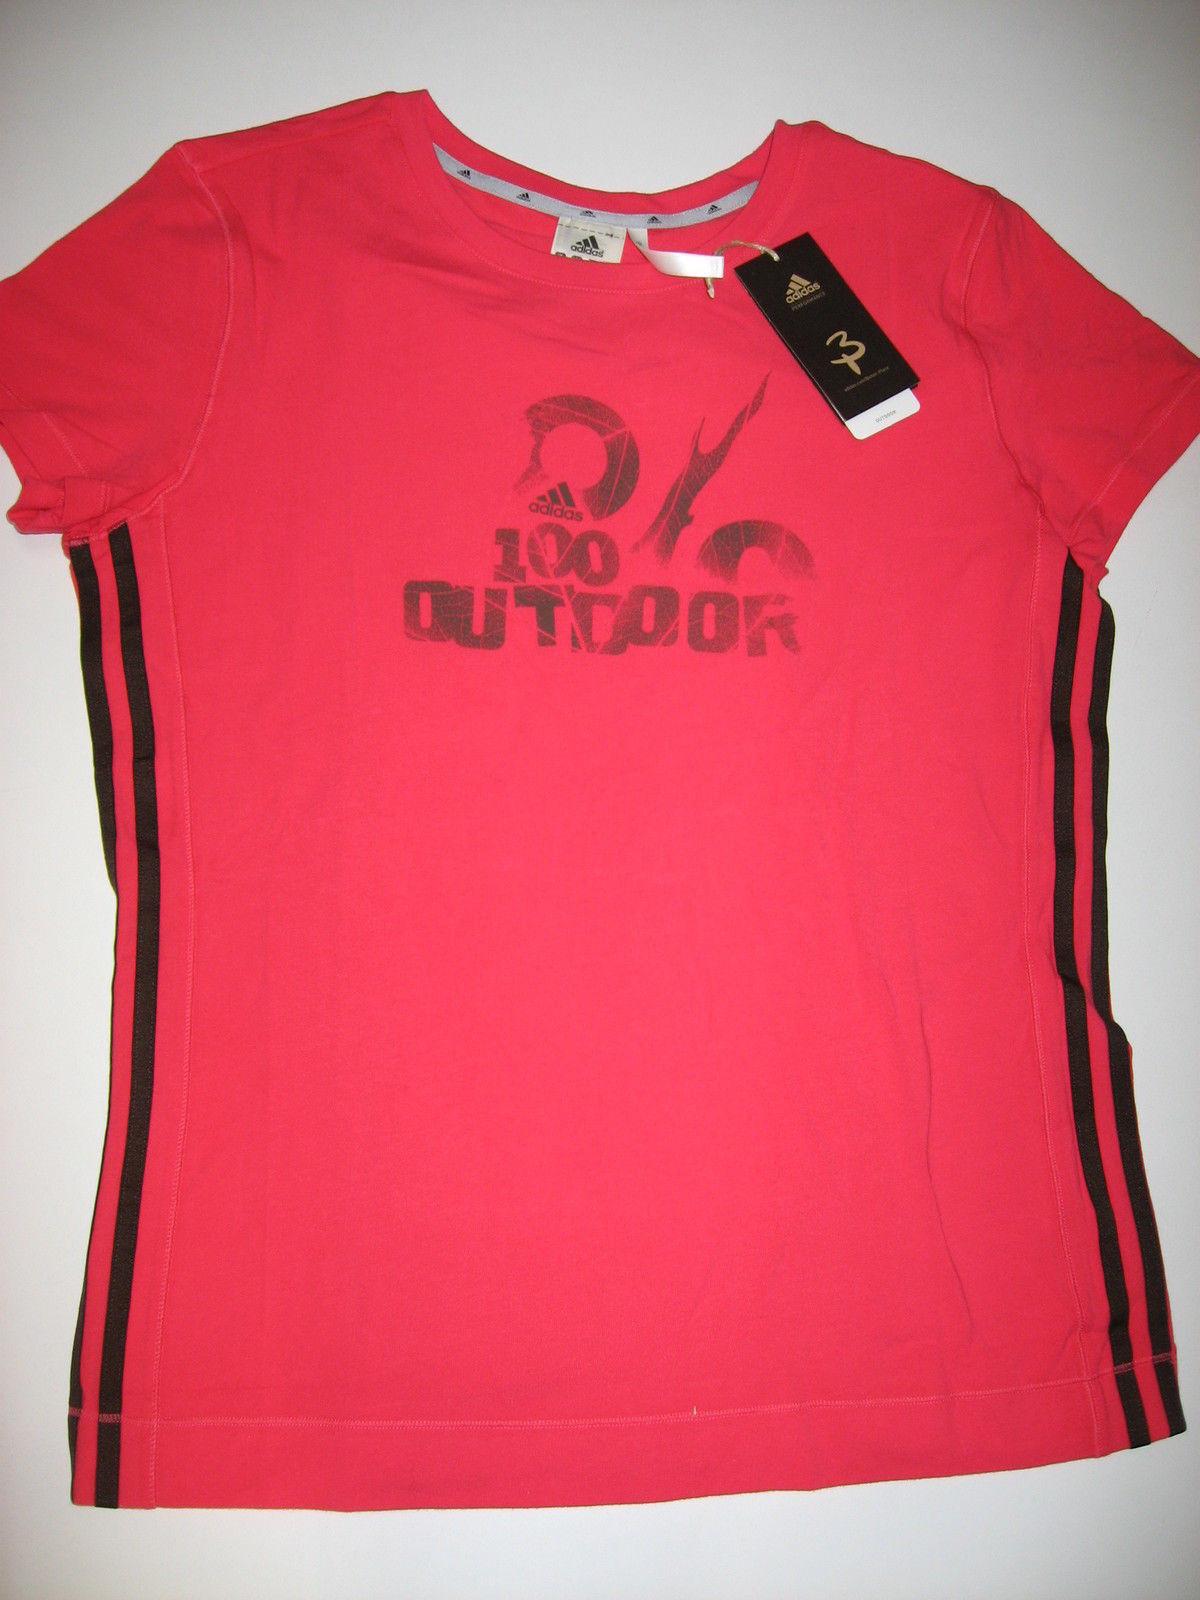 Adidas p09853 Purah Shirt Hiking Outdoor Organic Cotton Cotton